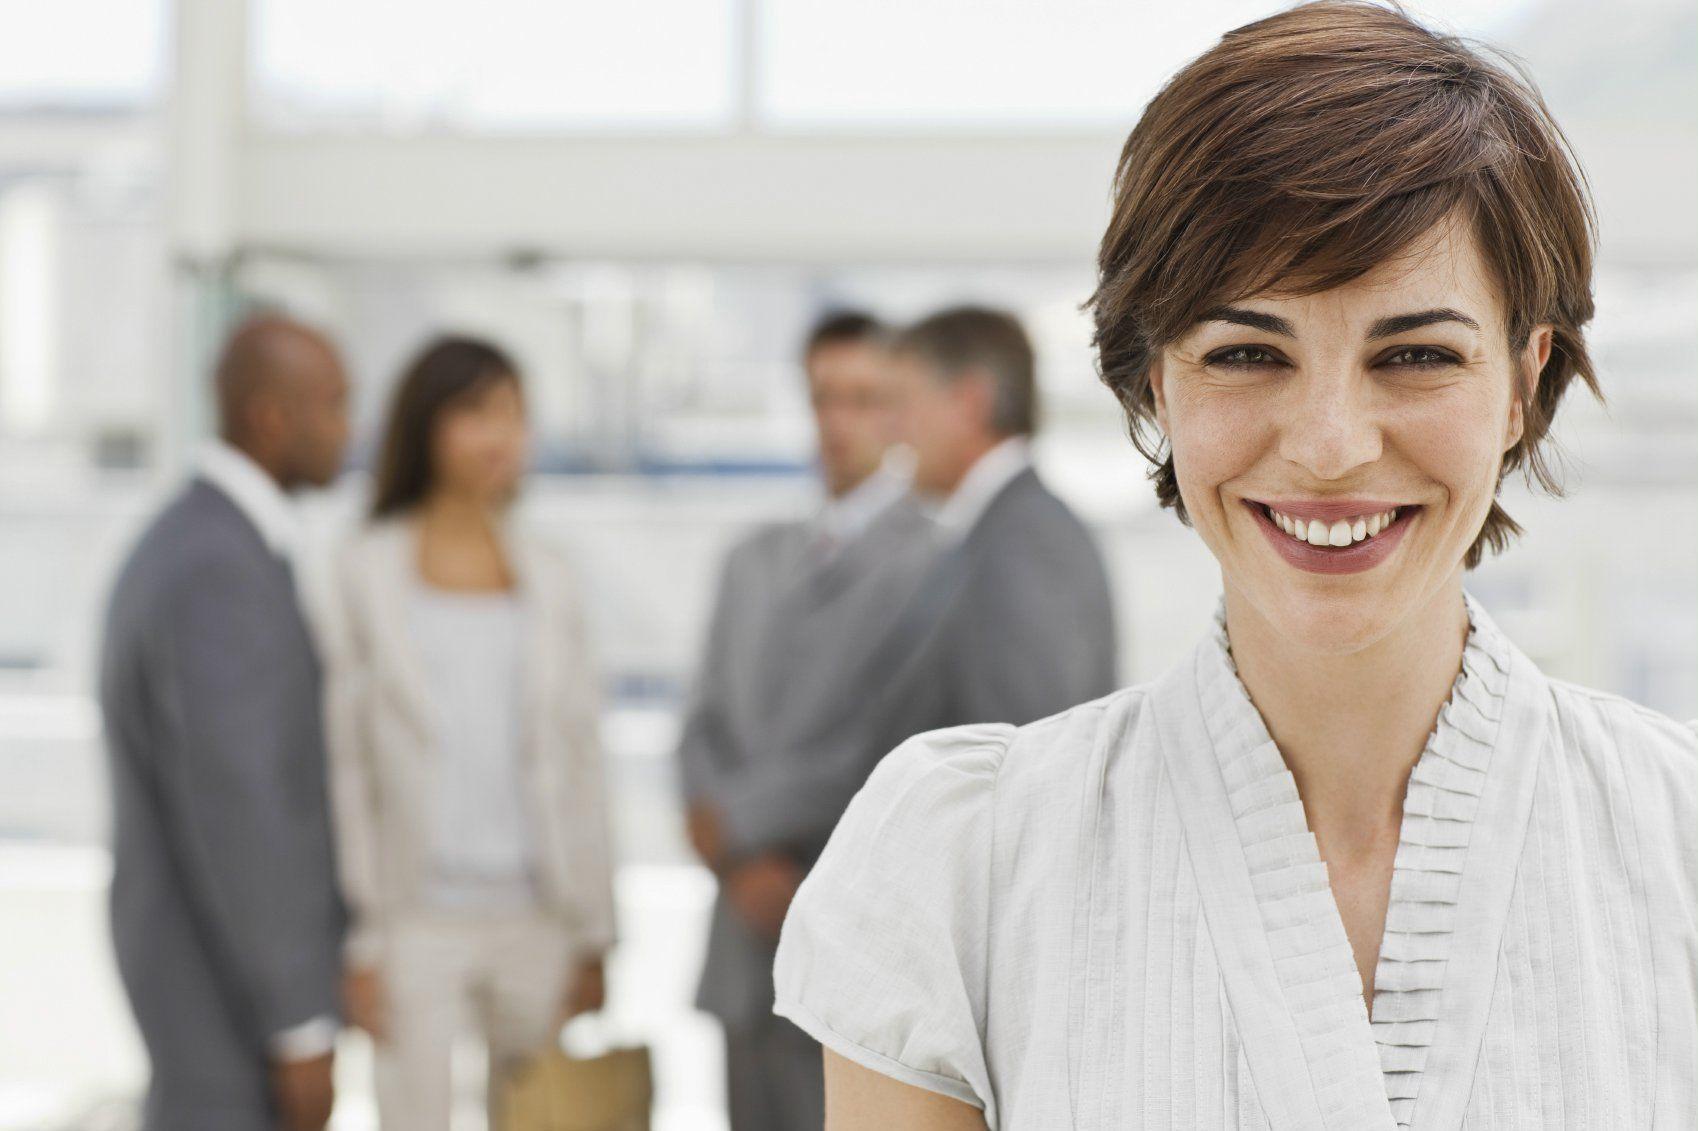 istock_000007068543medium-business-woman